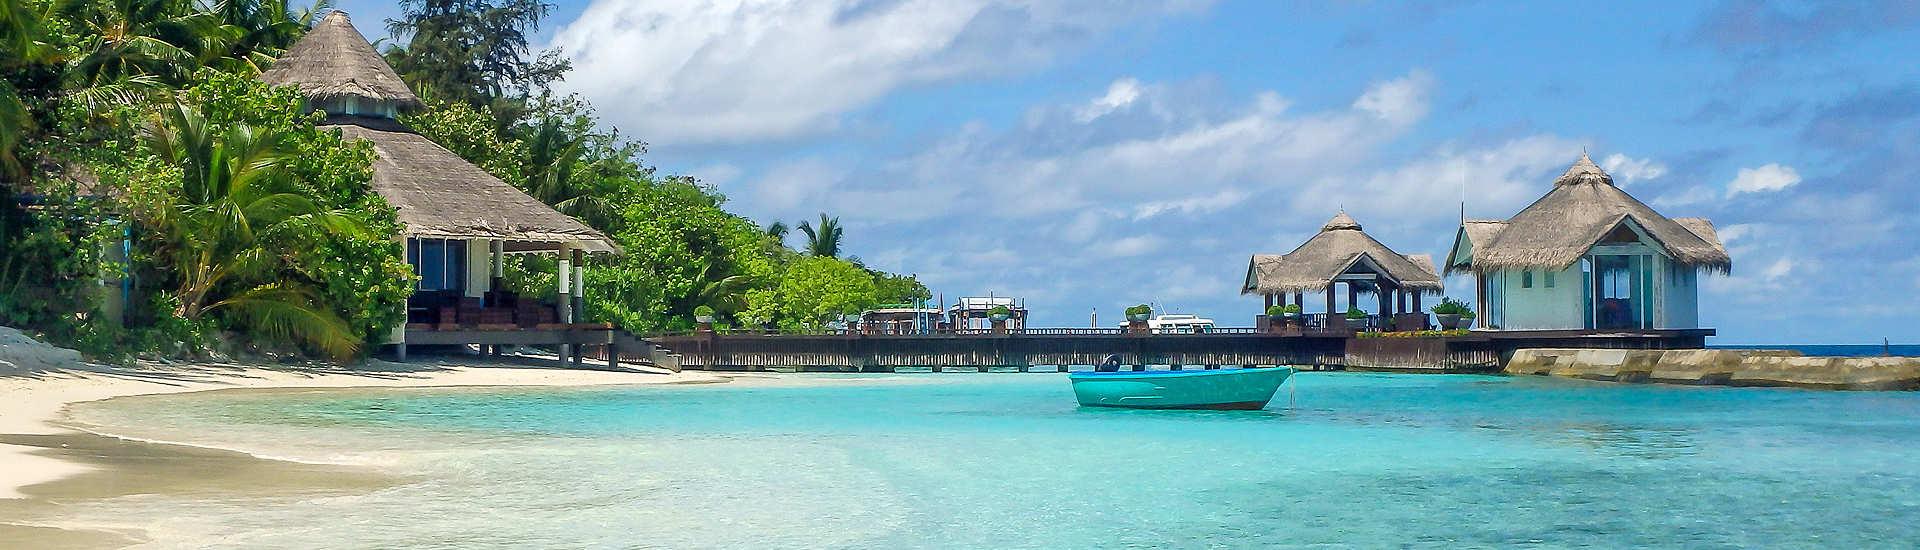 Tauchresort Malediven – Scuba Native Tauchreisen